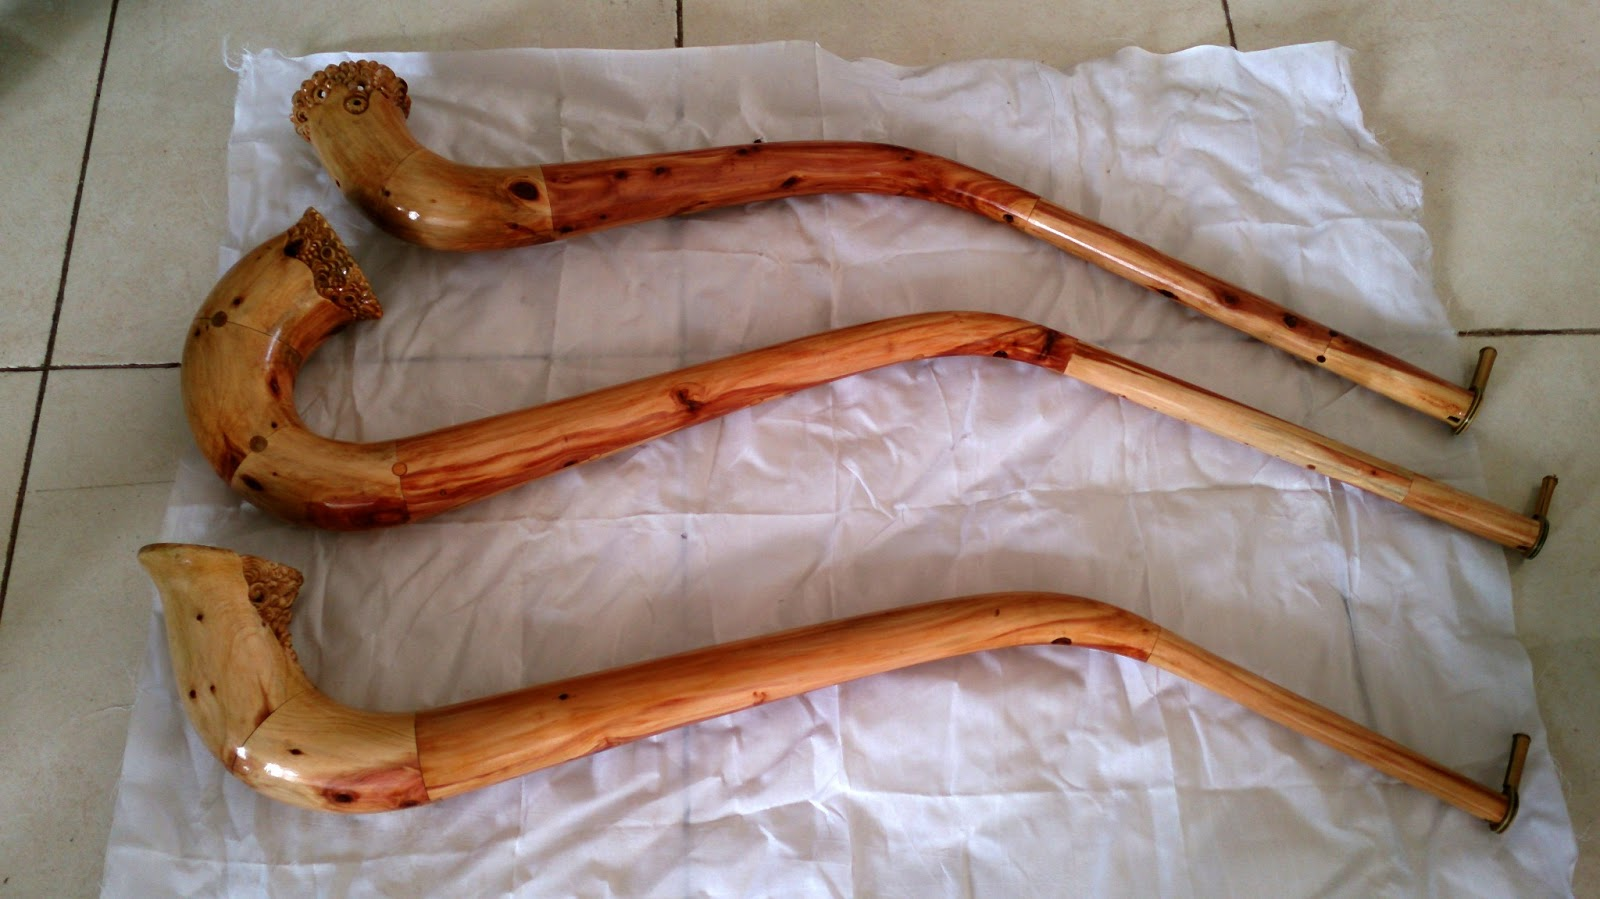 Inovasi bentuk seruling berbahan kayu digarap dalam pilihan tugas seni kriya kayu